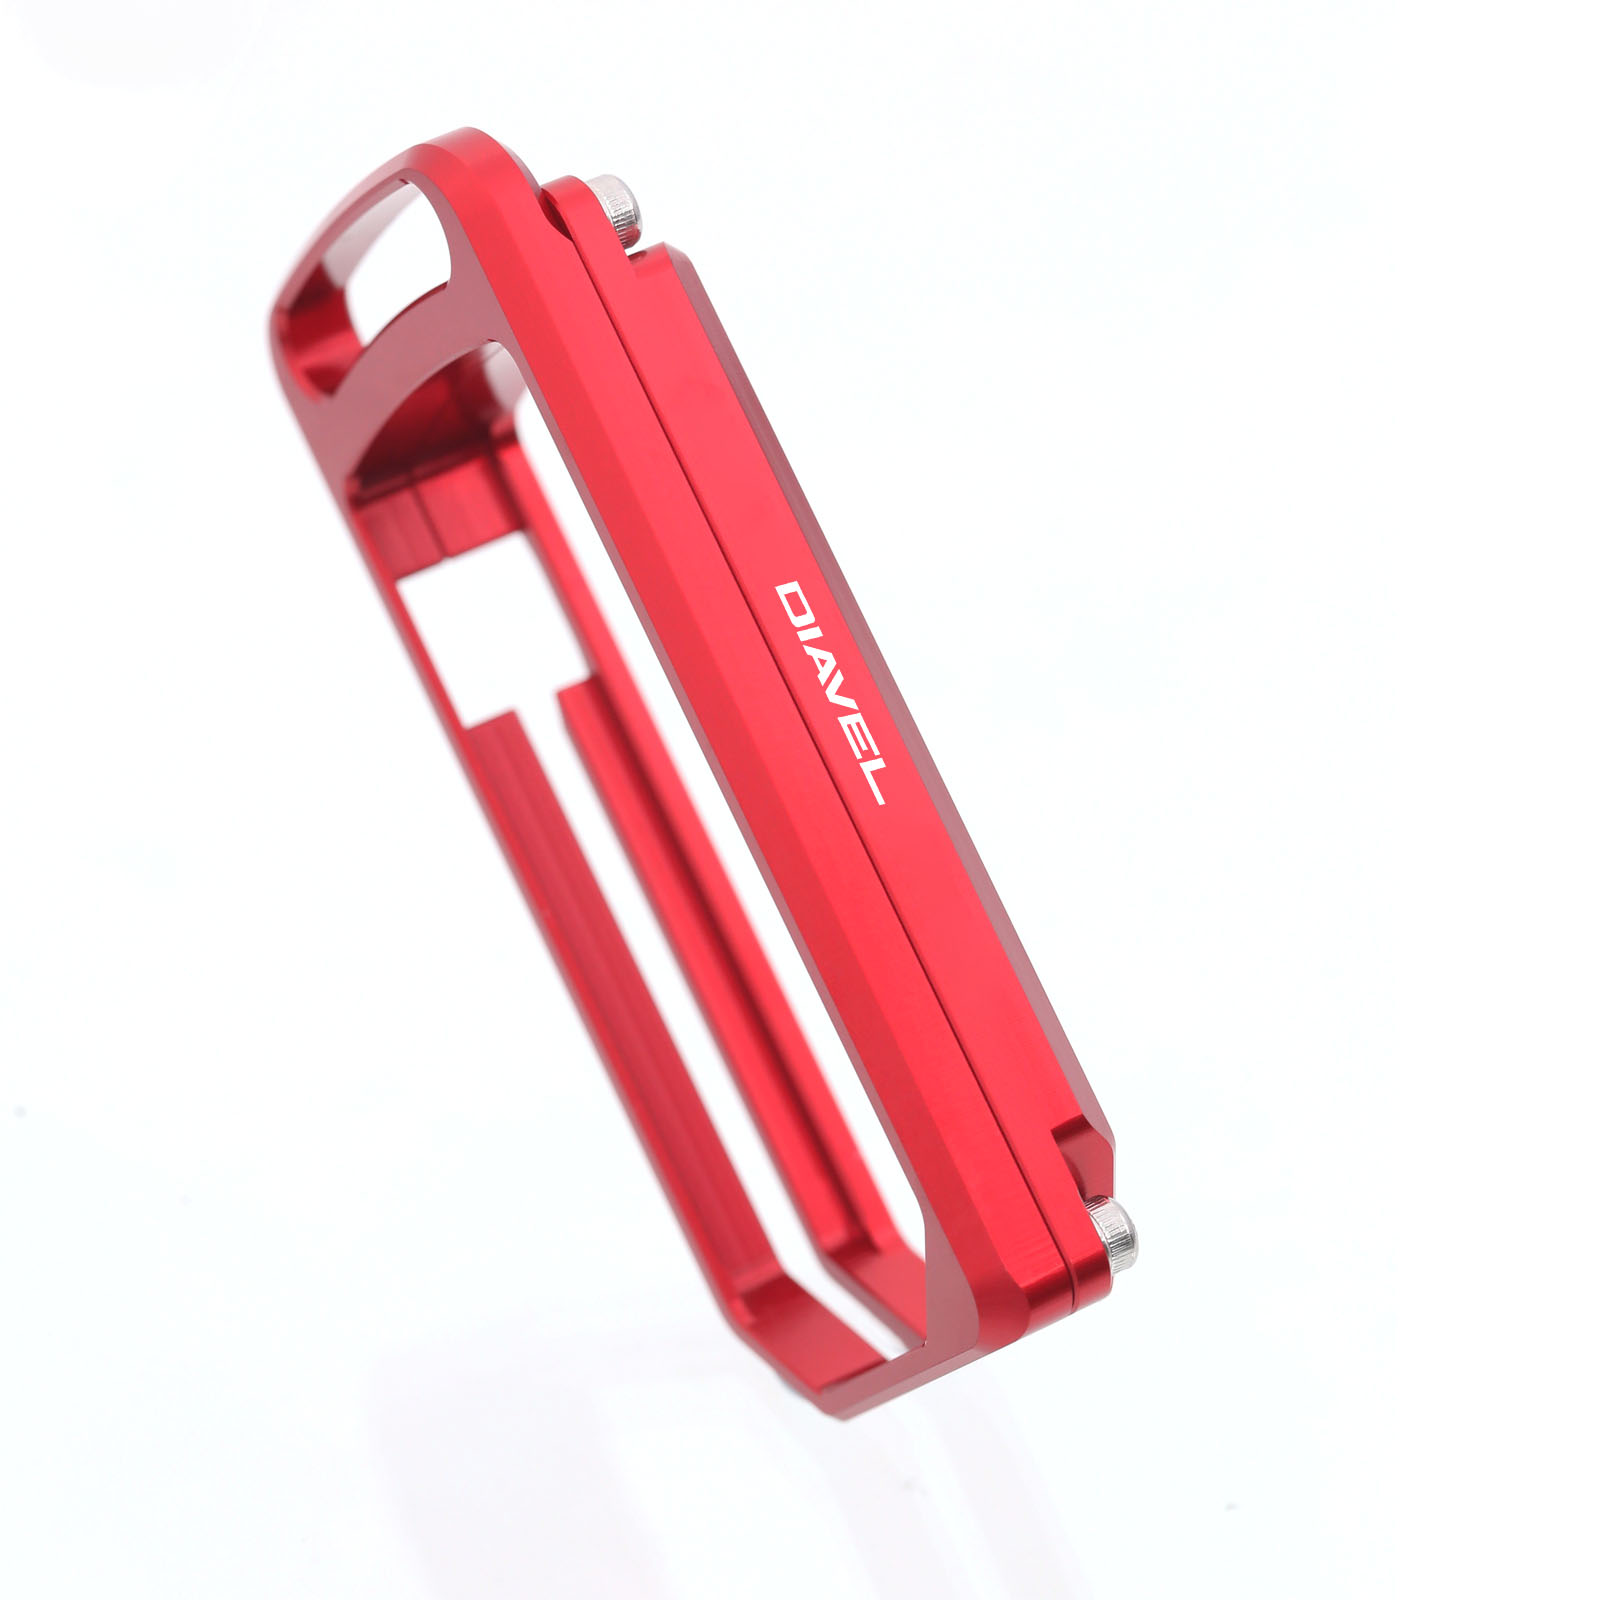 Ducati DIAVEL Black Gold Red Motorcycle Key Case Holder